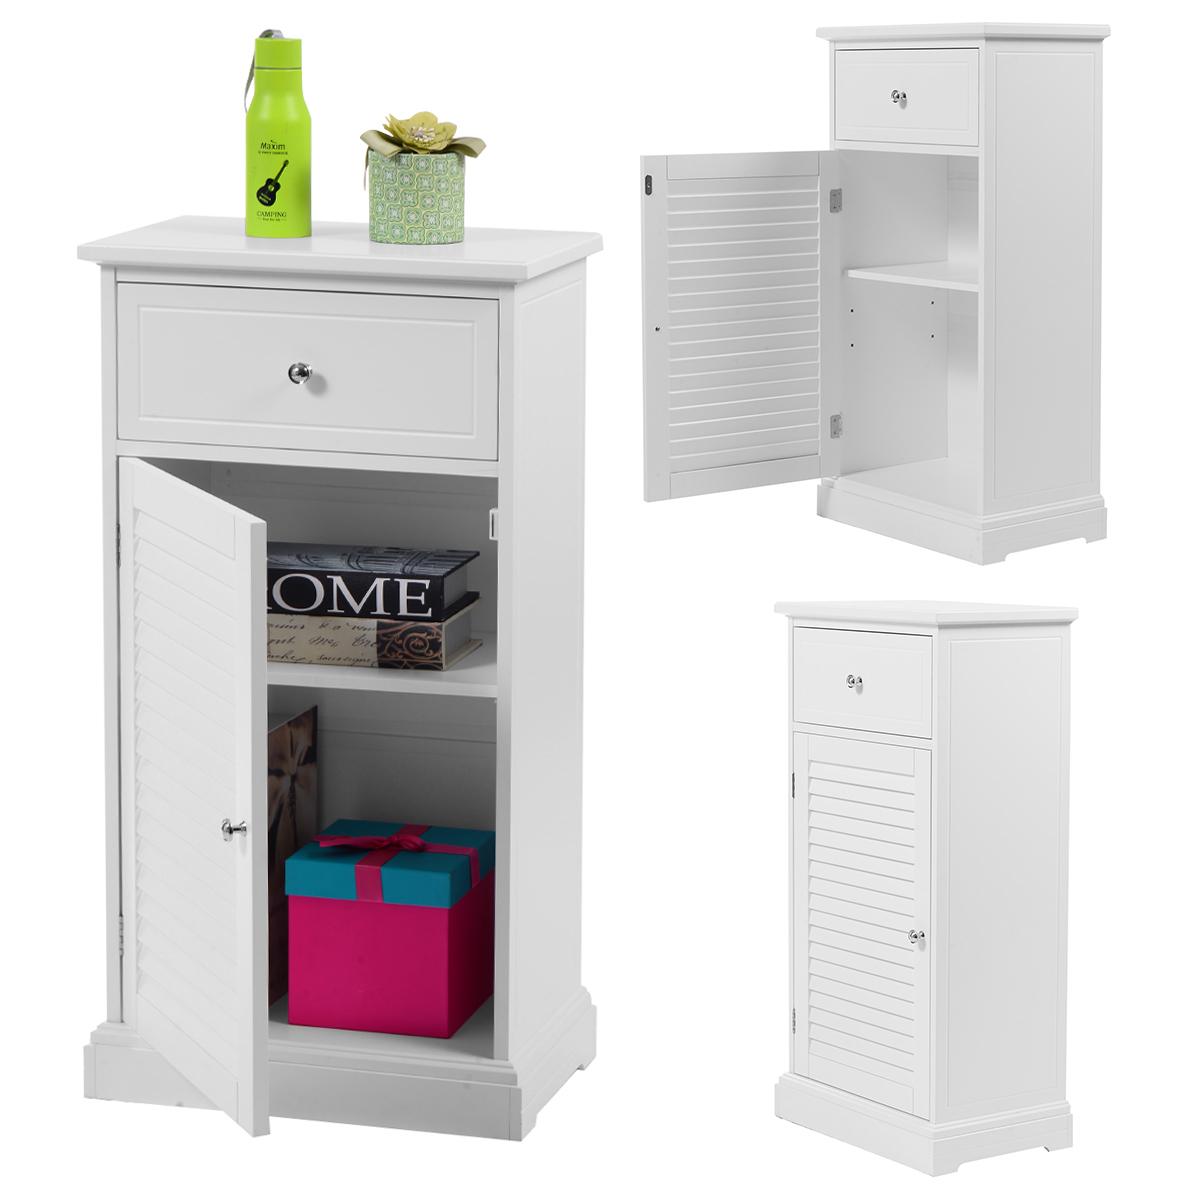 Costway White Storage Floor Cabinet Wall Shutter Door Bathroom Organizer Cupboard Shelf